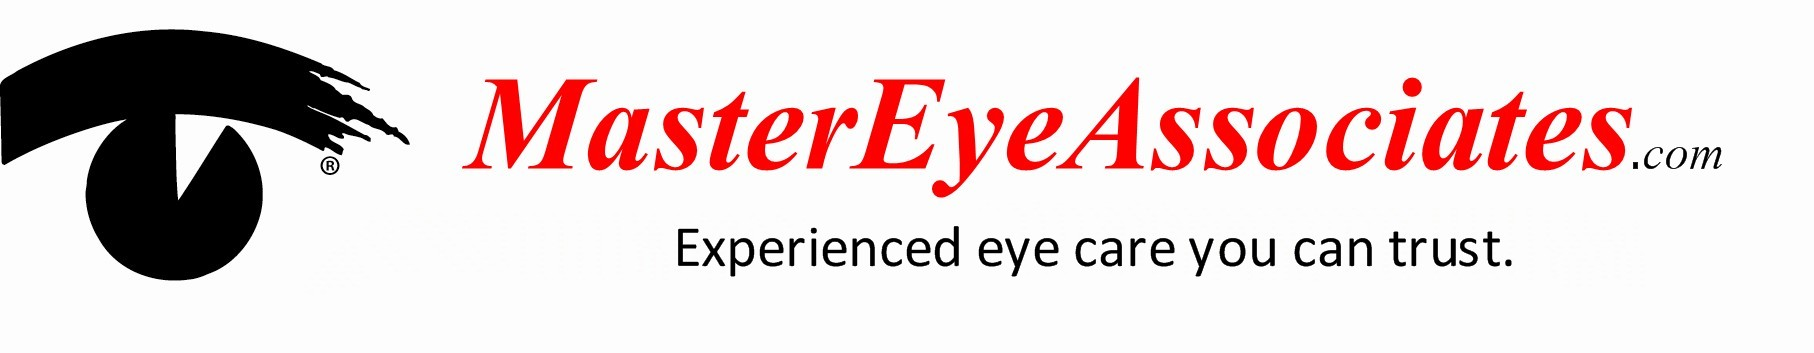 Master Eye Associates, austin eye doctors, optometrists, glaucoma specialists